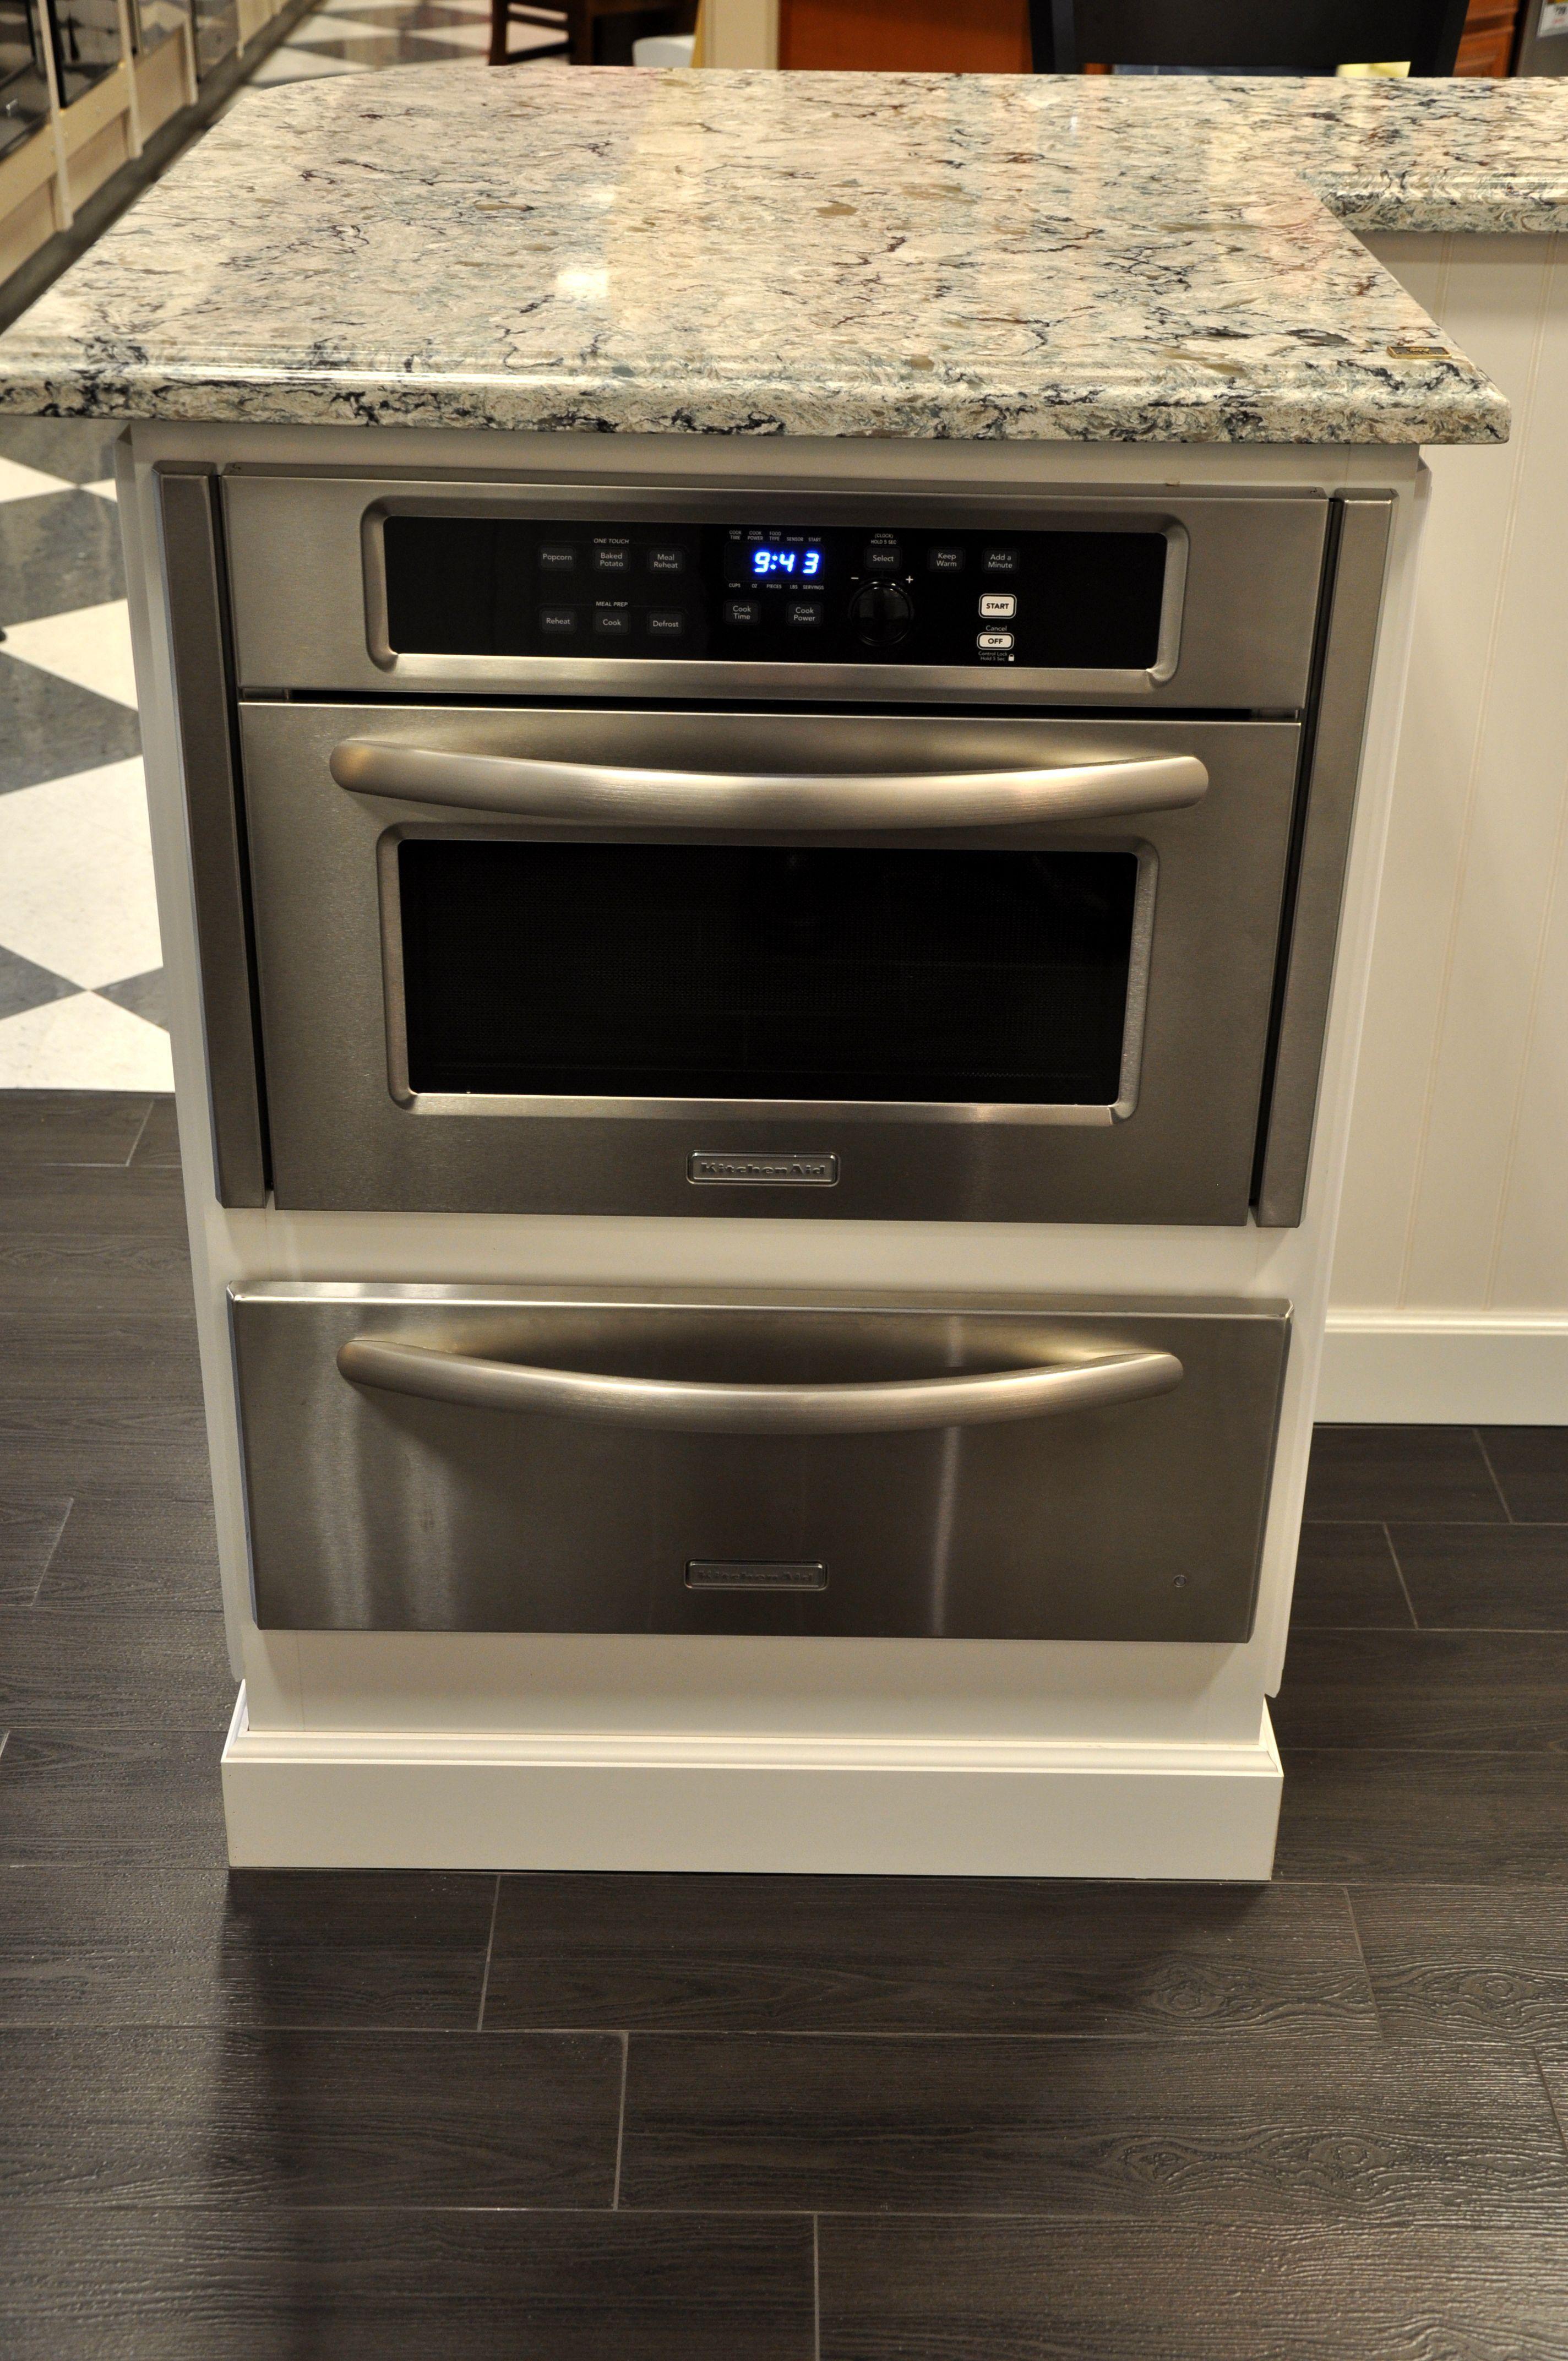 Kitchenaid Mircowave With Slow Cook Warming Drawer Below Built In Microwave Cabinet Outdoor Kitchen Appliances Kitchen Island Design